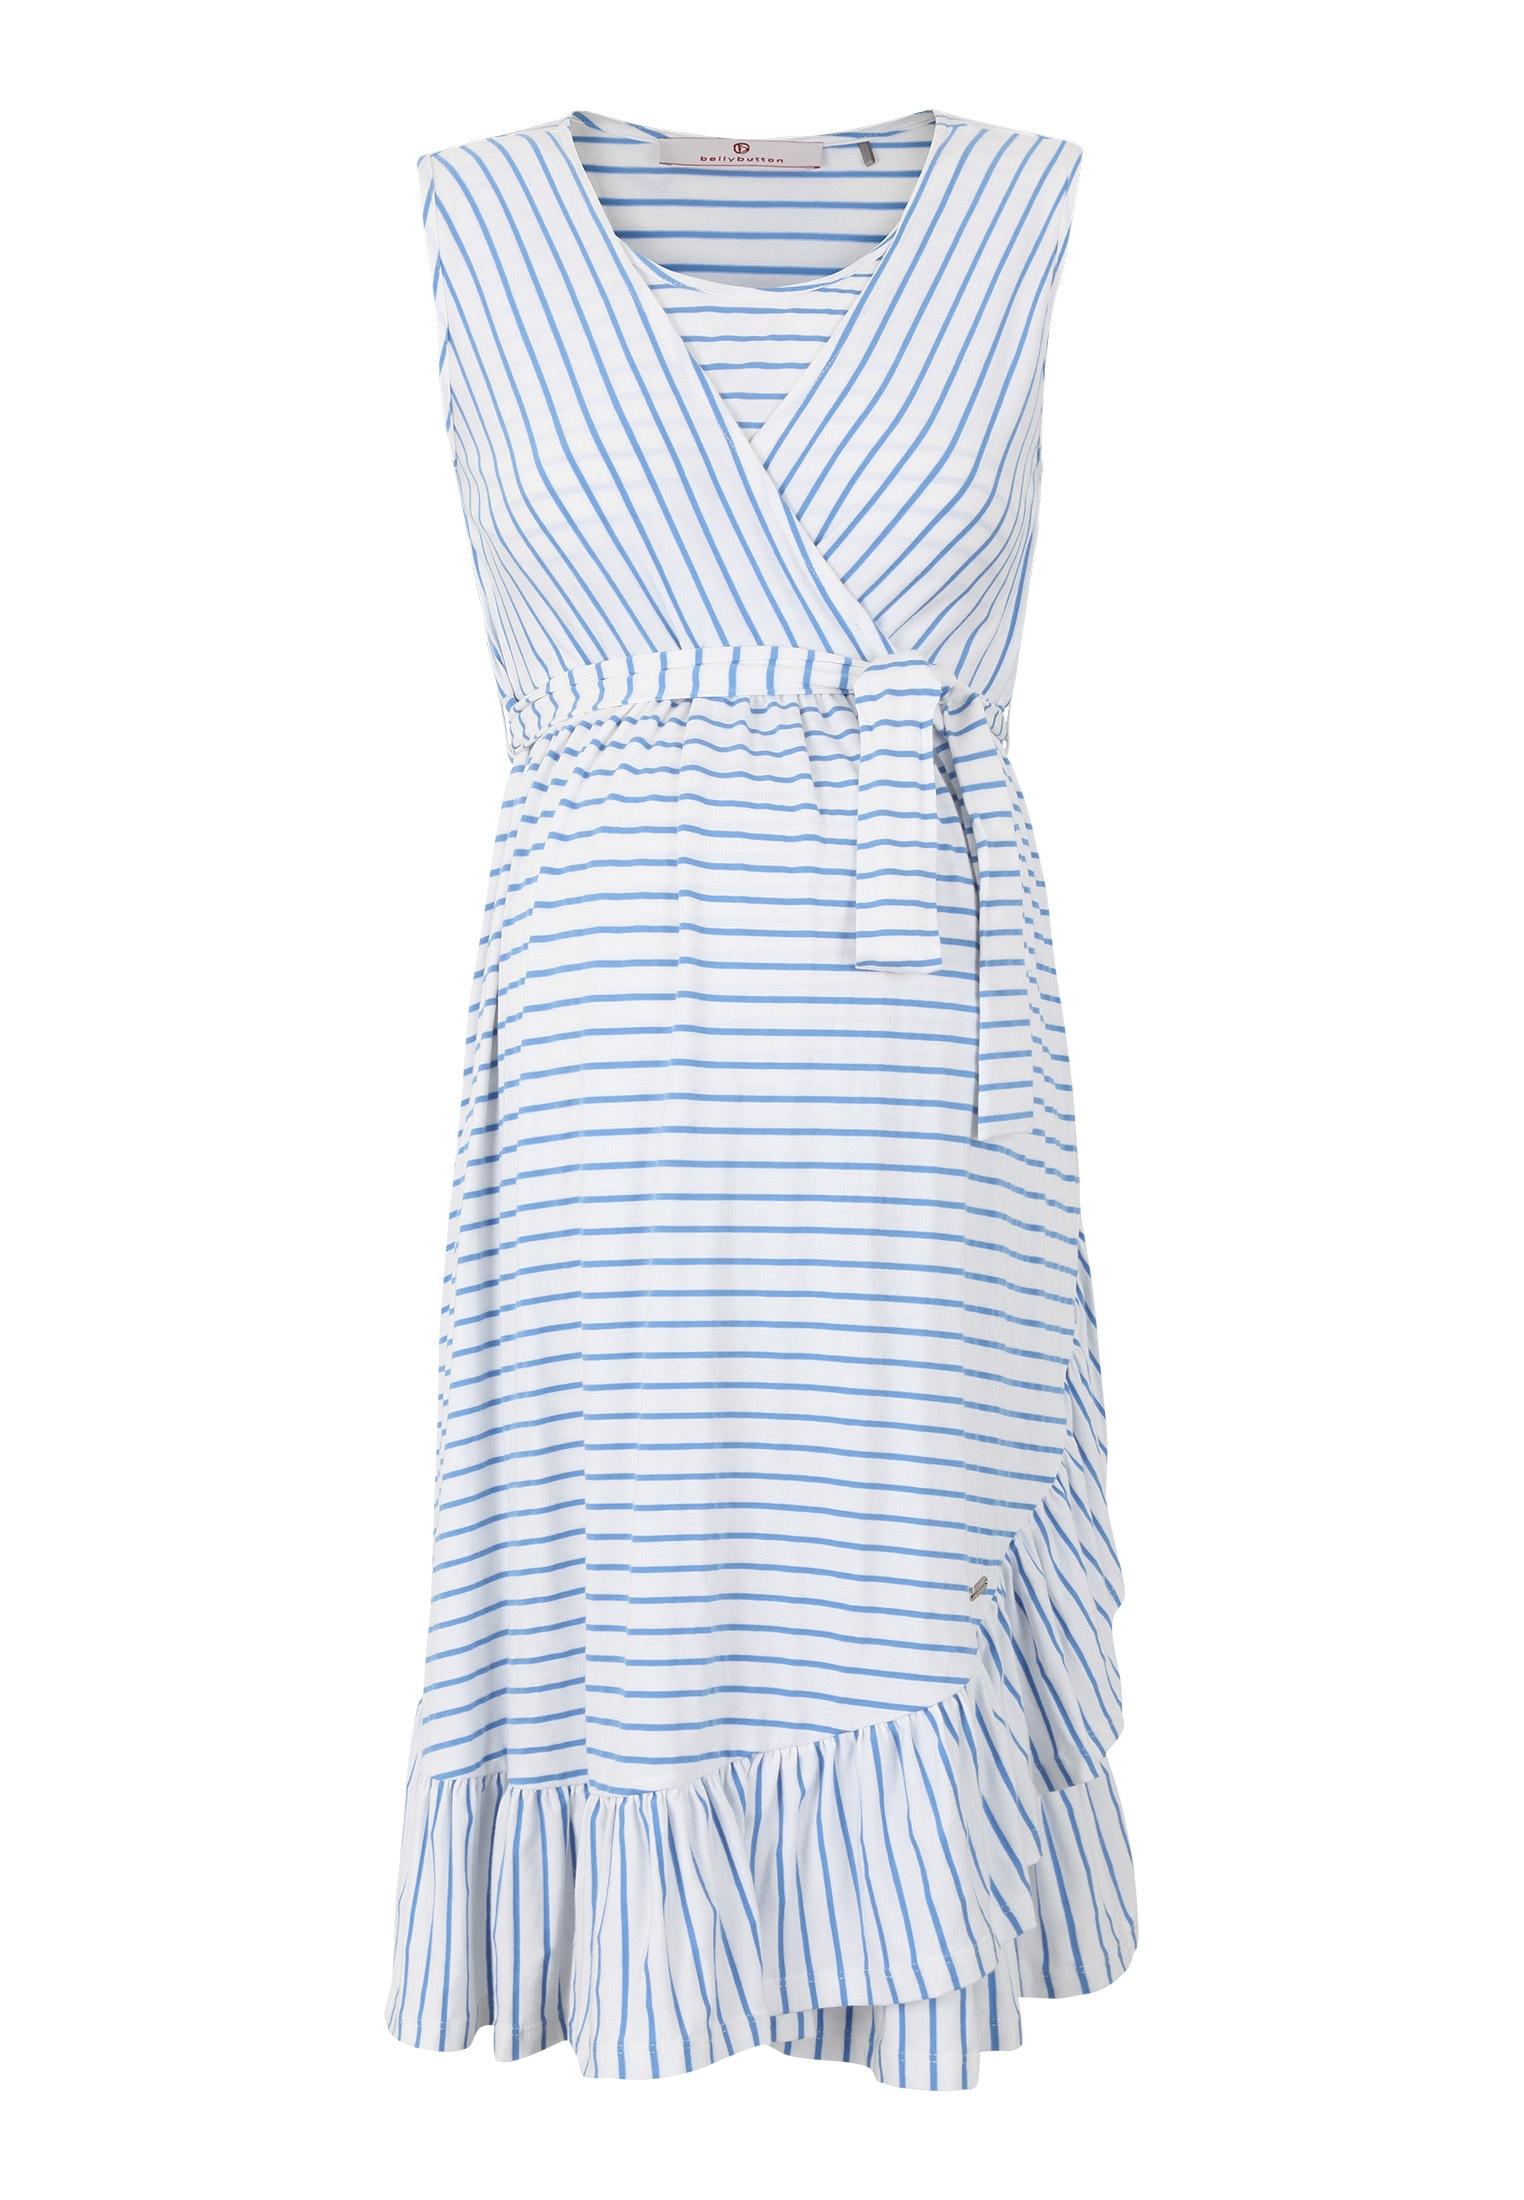 bellybutton -  Stillkleid, Umstands-/Still-Kleid ärmellos